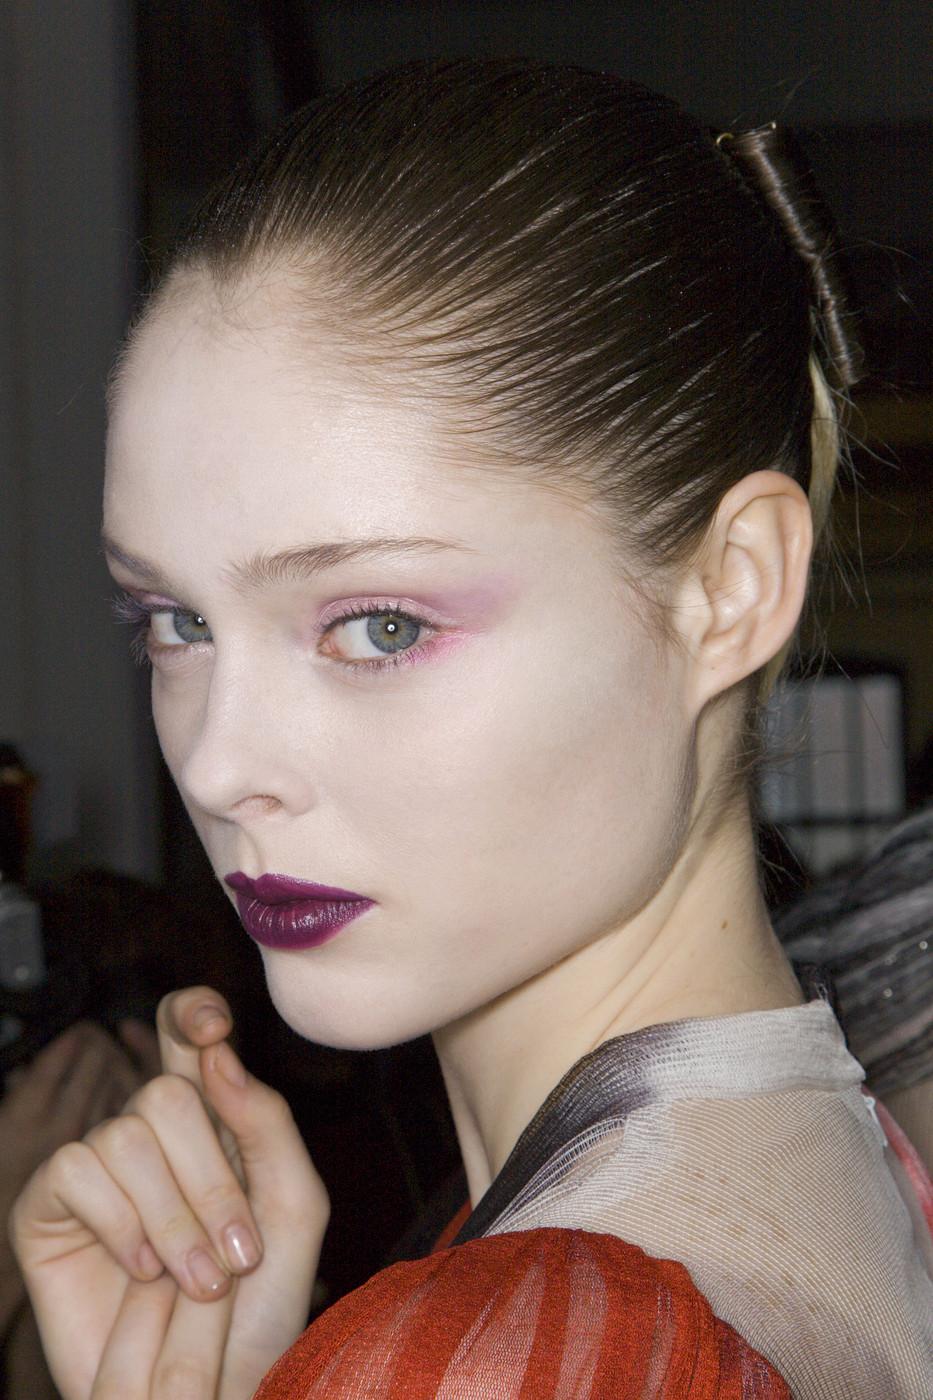 Laura Mercier Blemish-Less Foundation Primer & Tinted Moisturizer